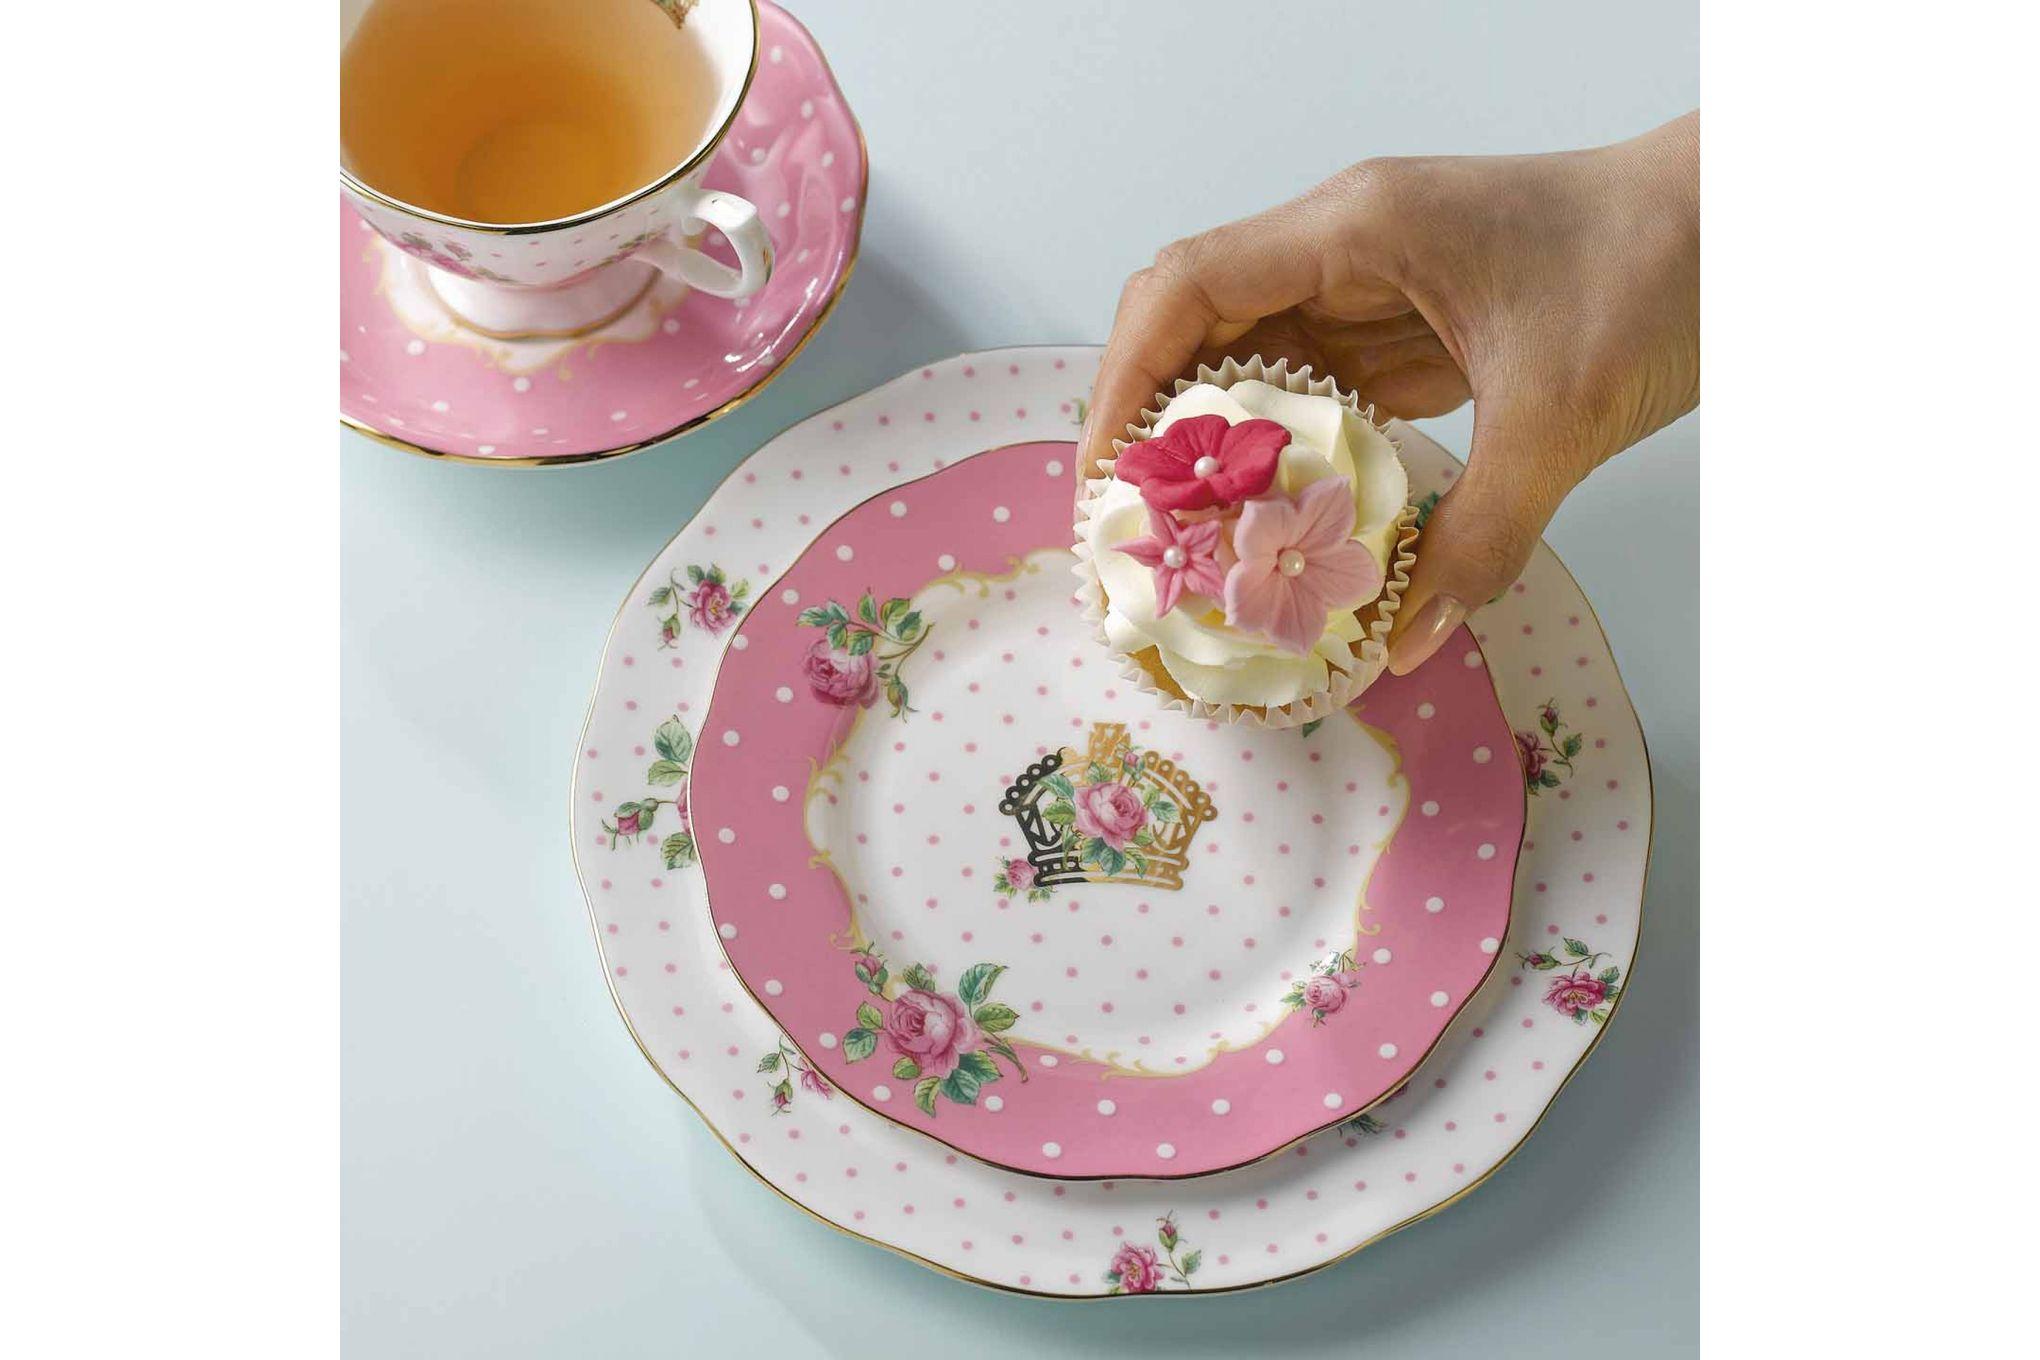 Royal Albert Cheeky Pink Starter / Salad / Dessert Plate Vintage Shape 20cm thumb 3